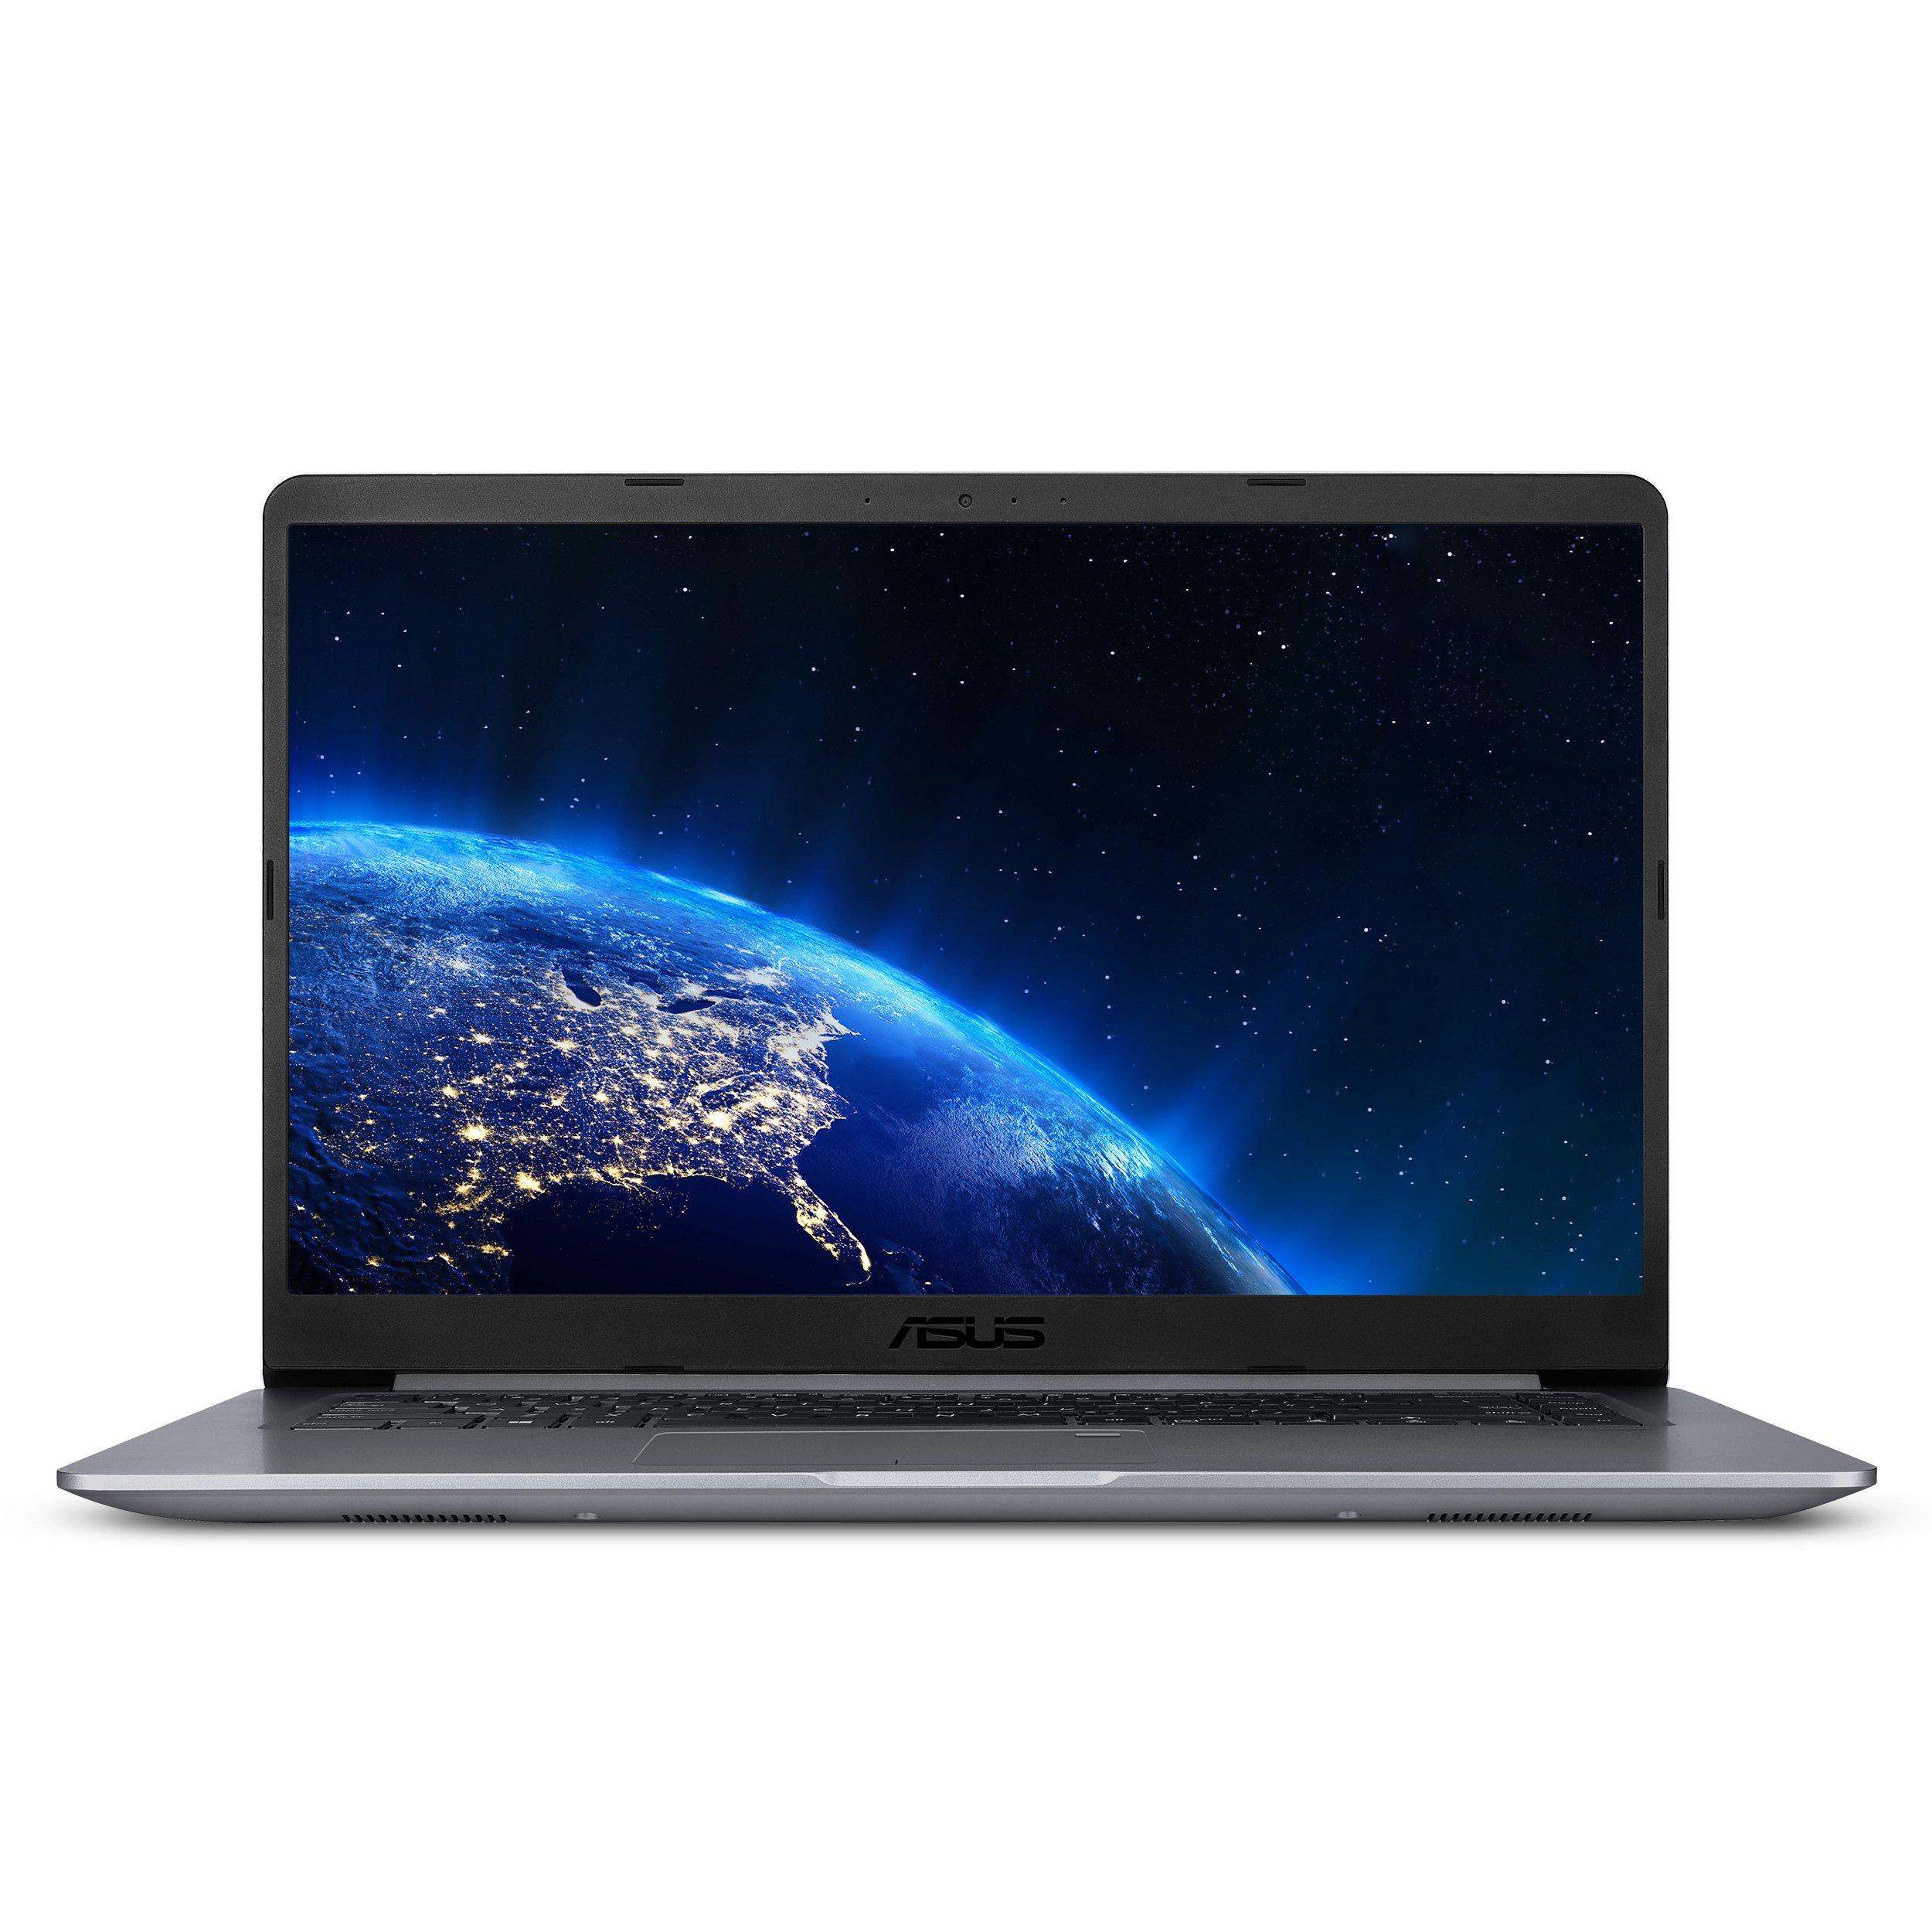 ASUS VivoBook F510UA FHDノートブック、Intel Core i5-8250U、8GB RAM、1TBハードドライブ、USB-Cスターグレーi5-8250U 8GB RAM 128GB SSD + 1TB HDD Windows 10